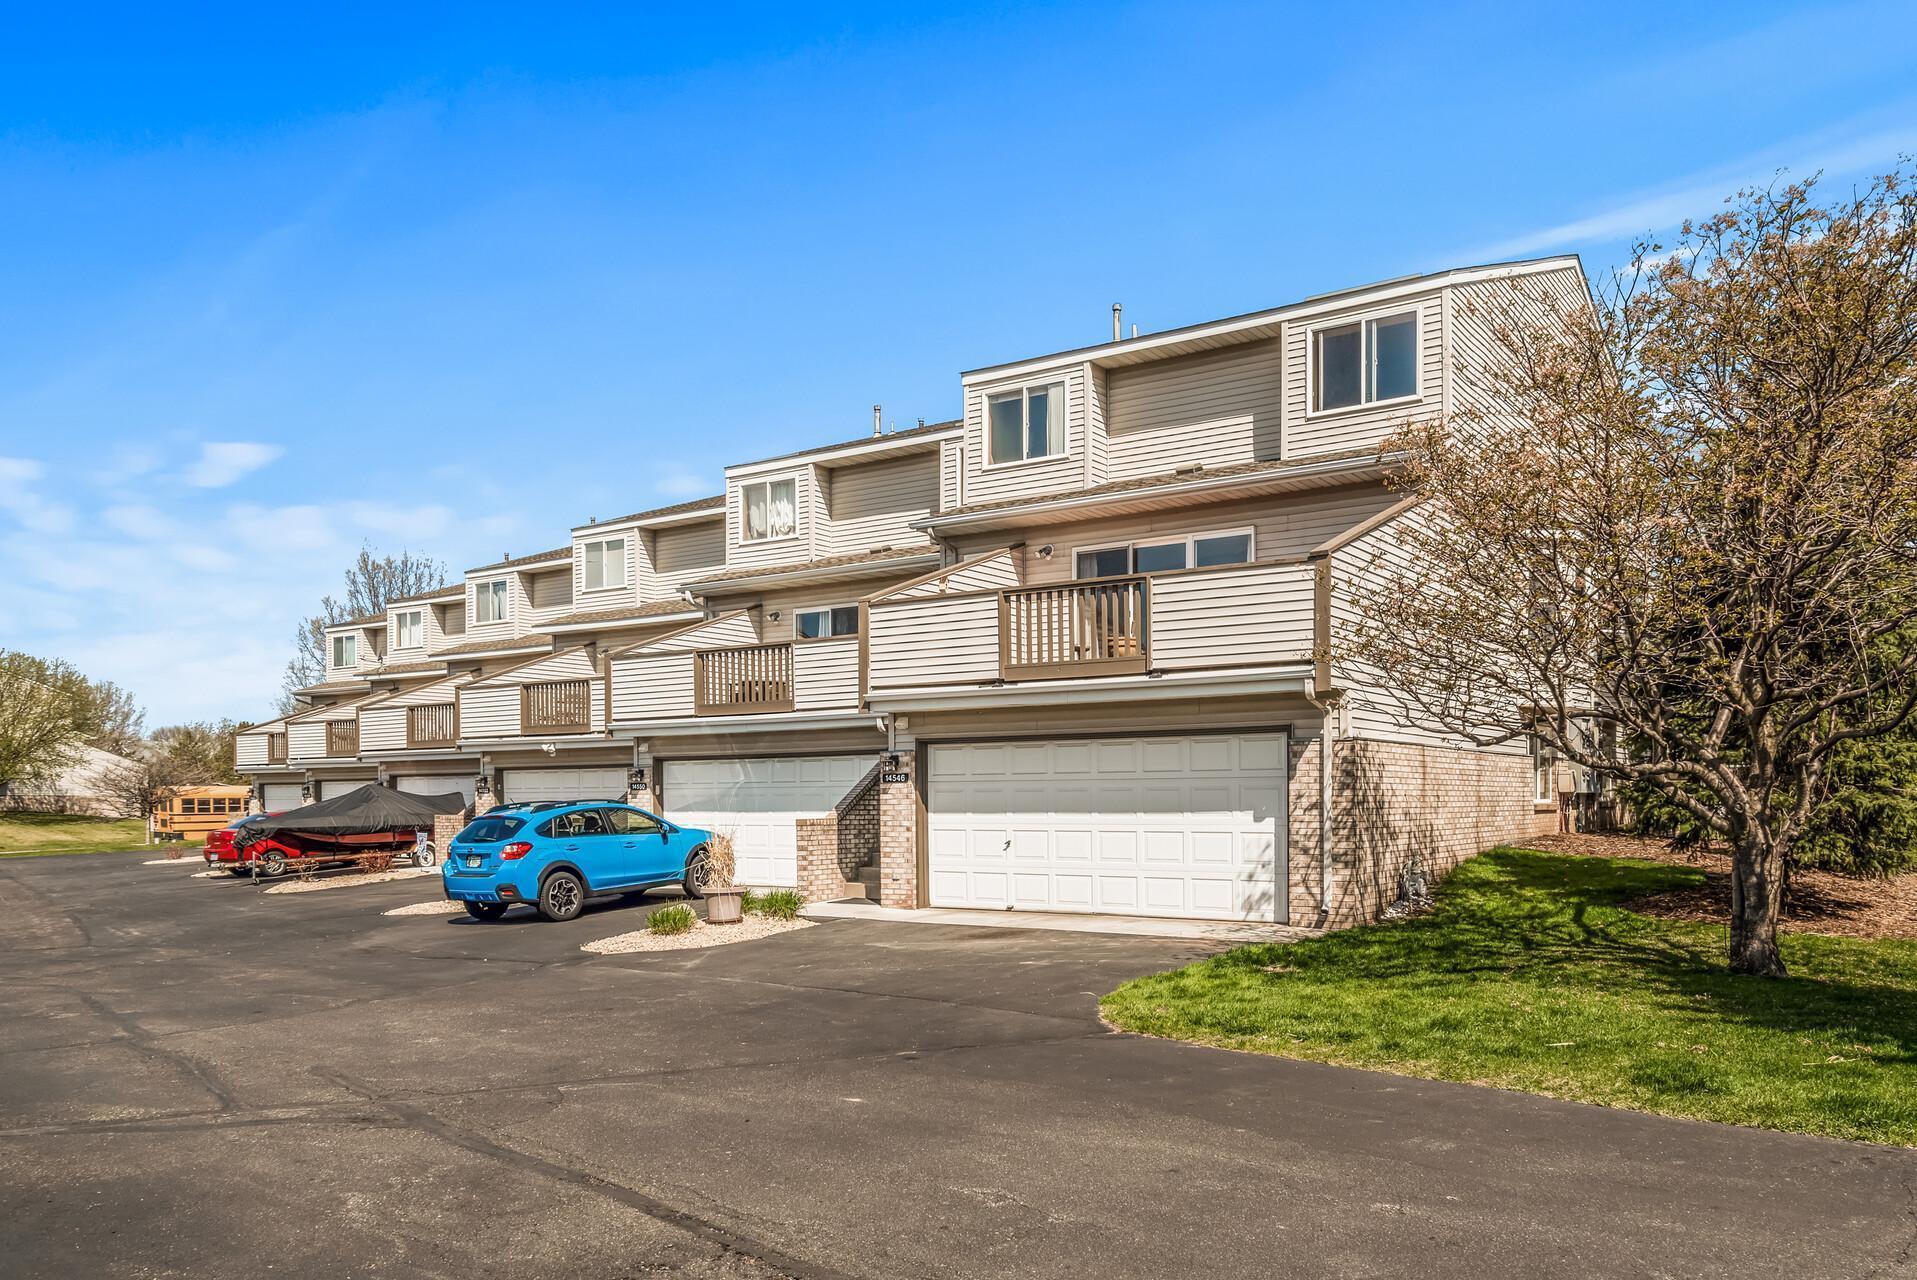 14546 Cobalt Avenue, Rosemount MN 55068 - Photo 2